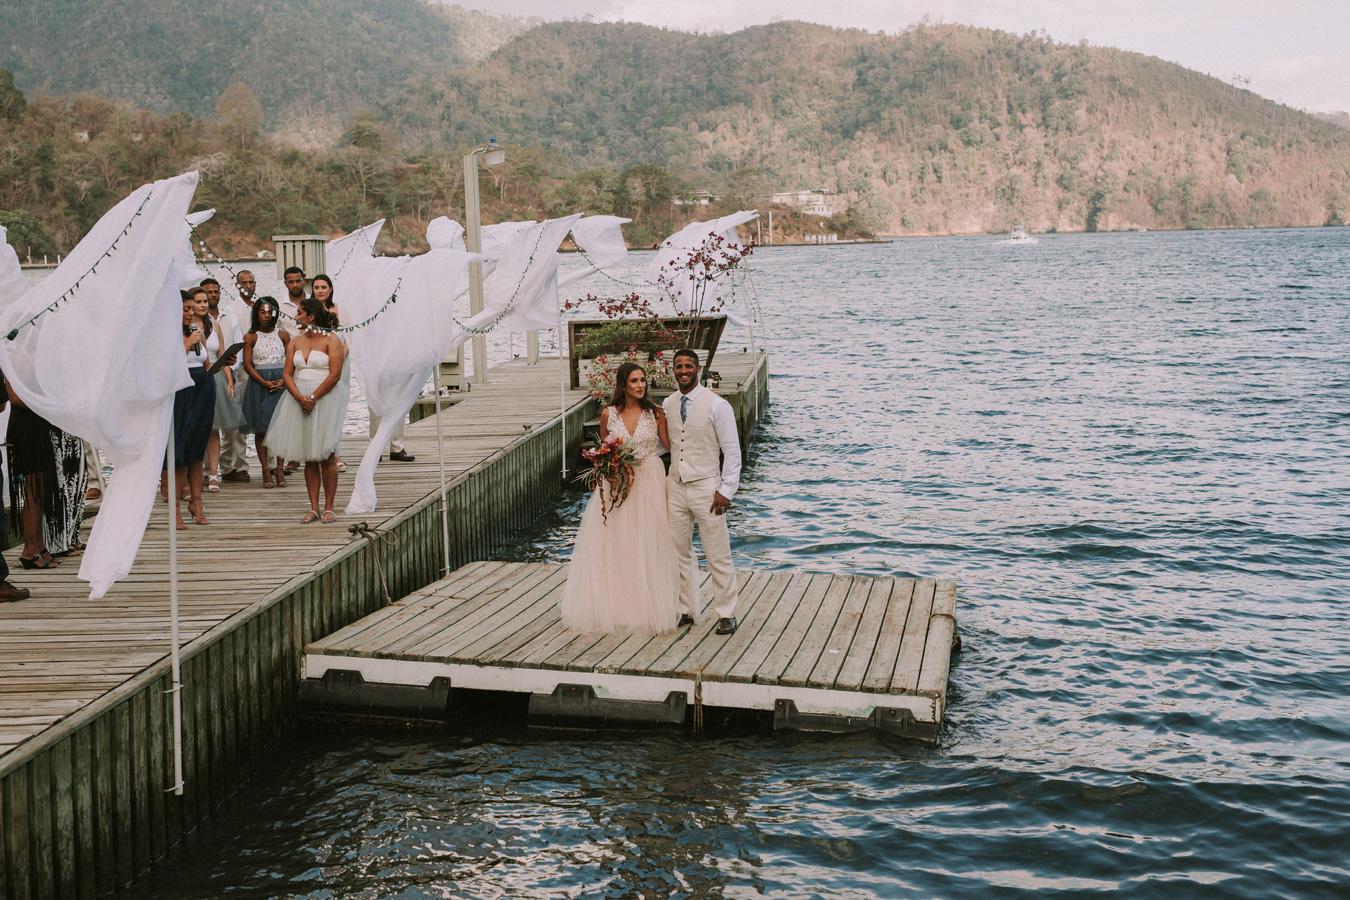 023-destinasjonsbryllup-bryllup-i-utlandet-tone-tvedt.jpg